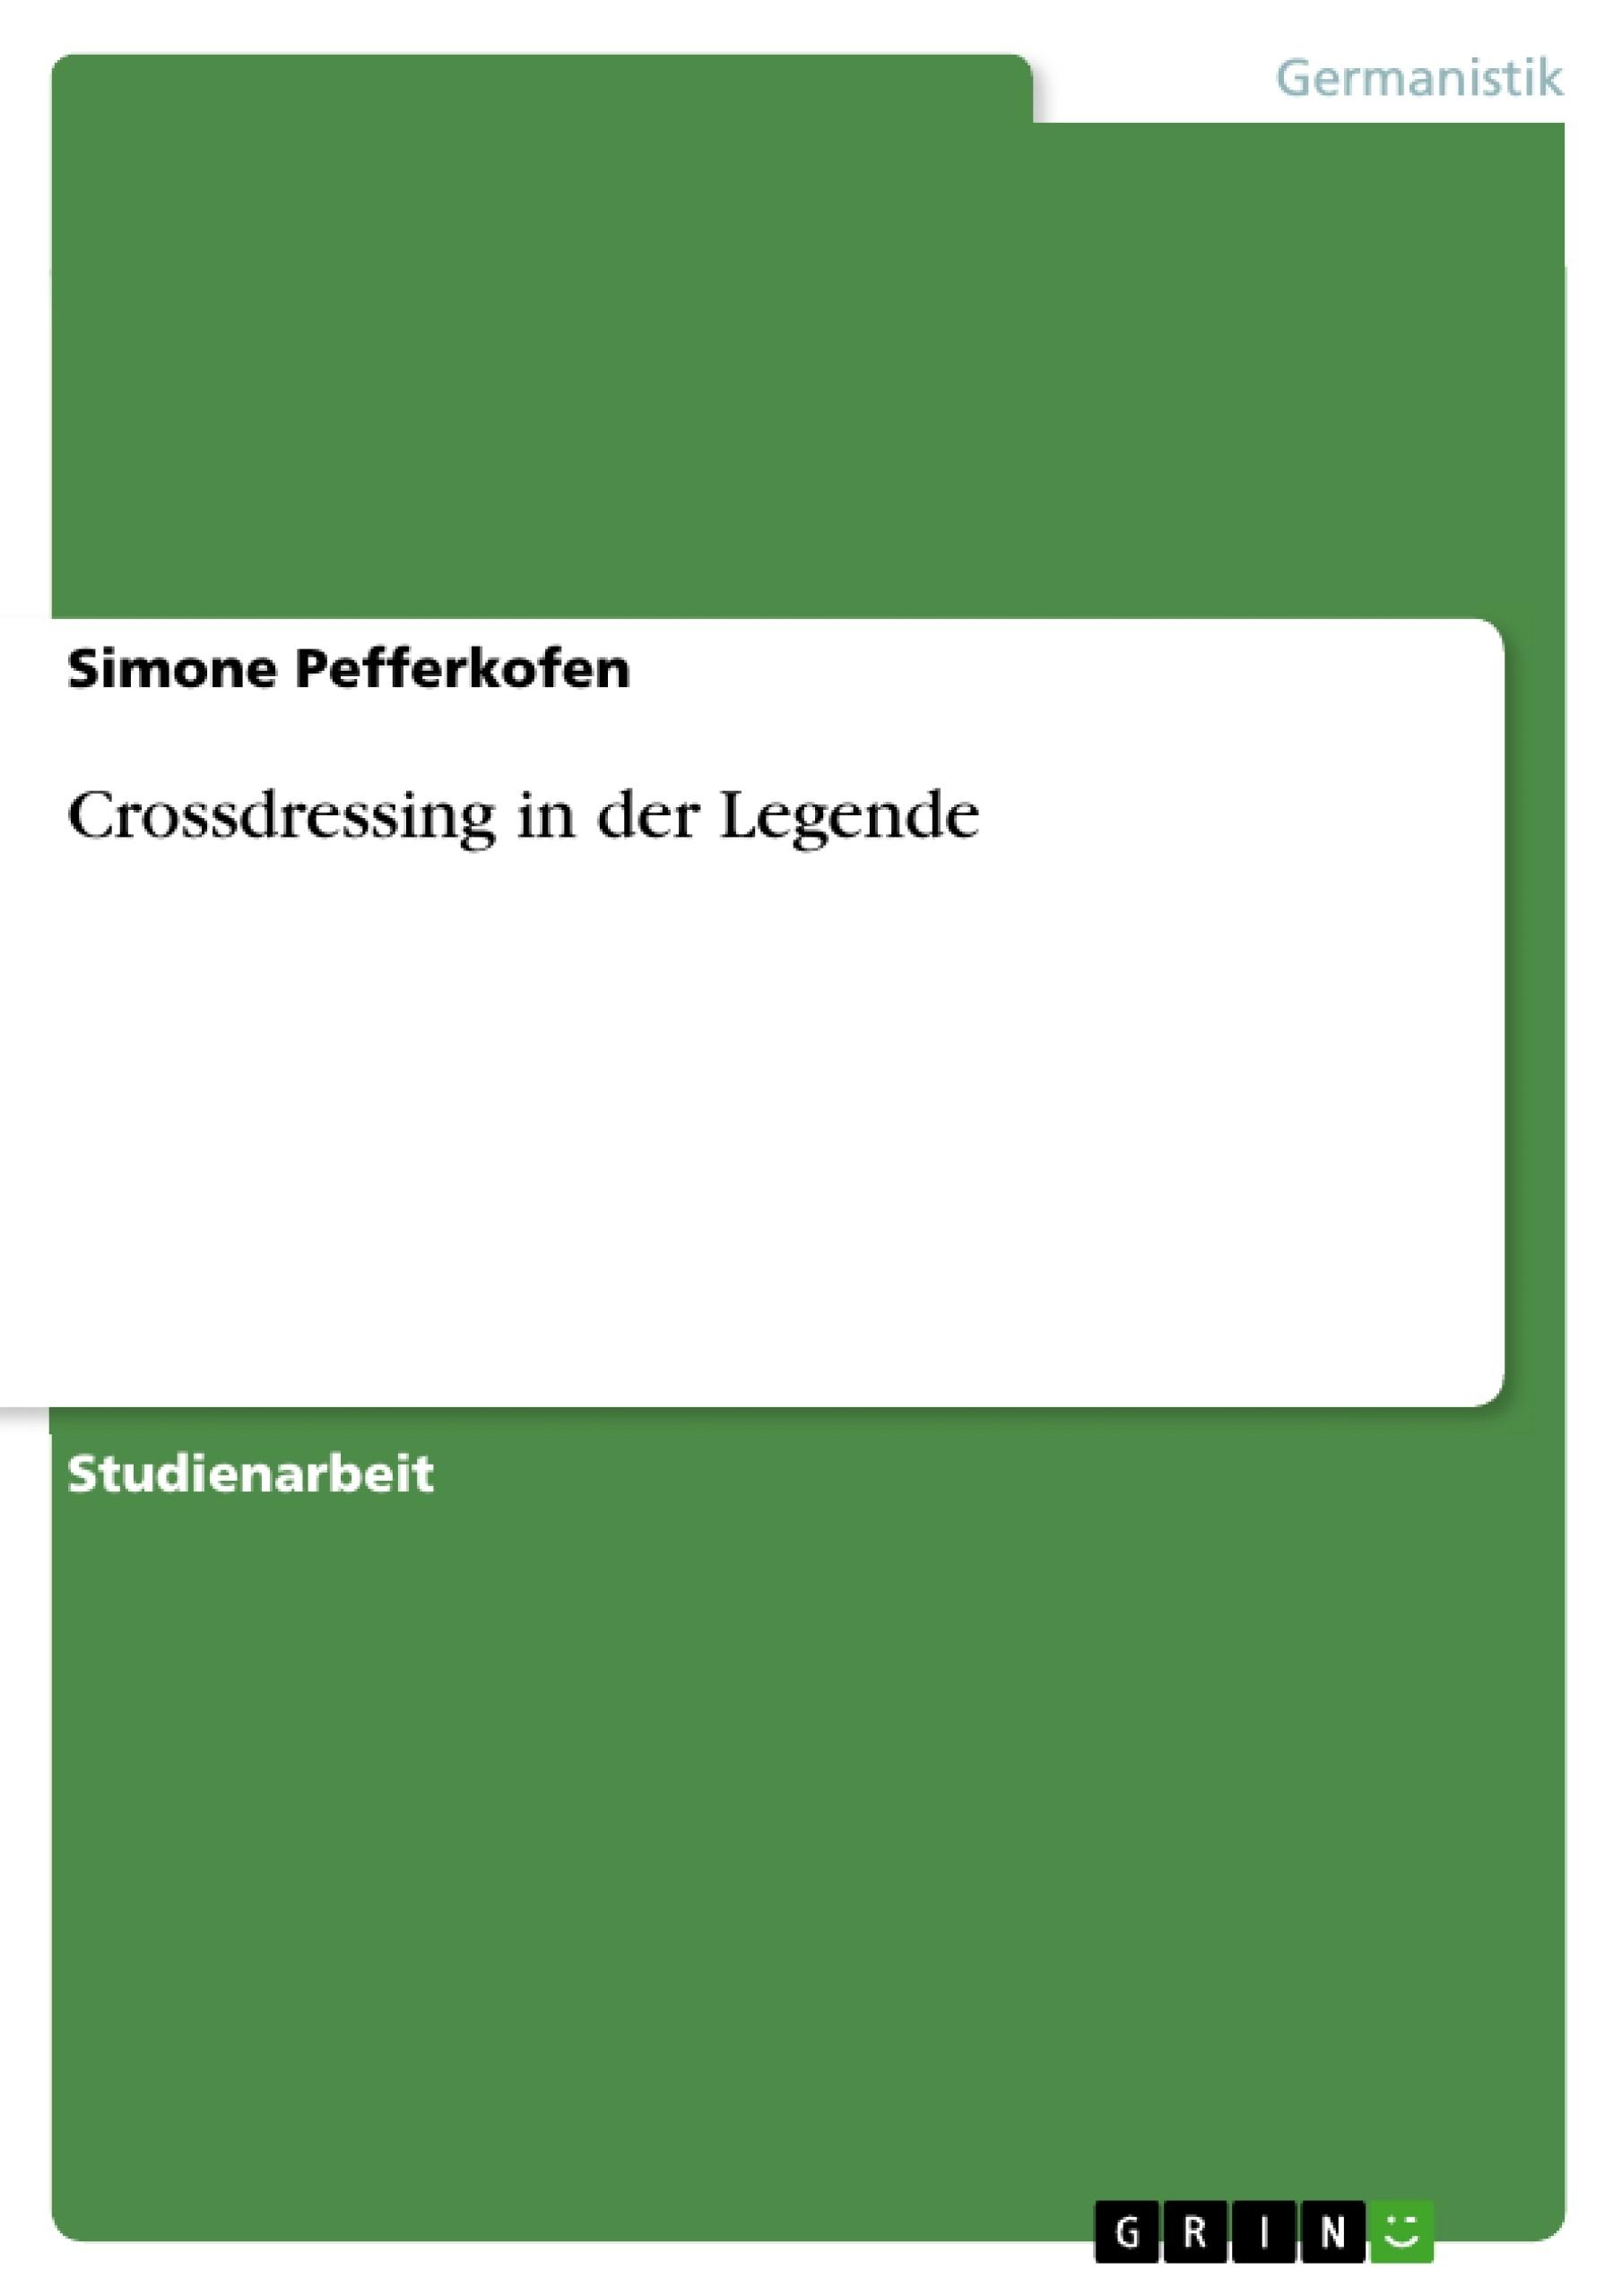 Titel: Crossdressing in der Legende